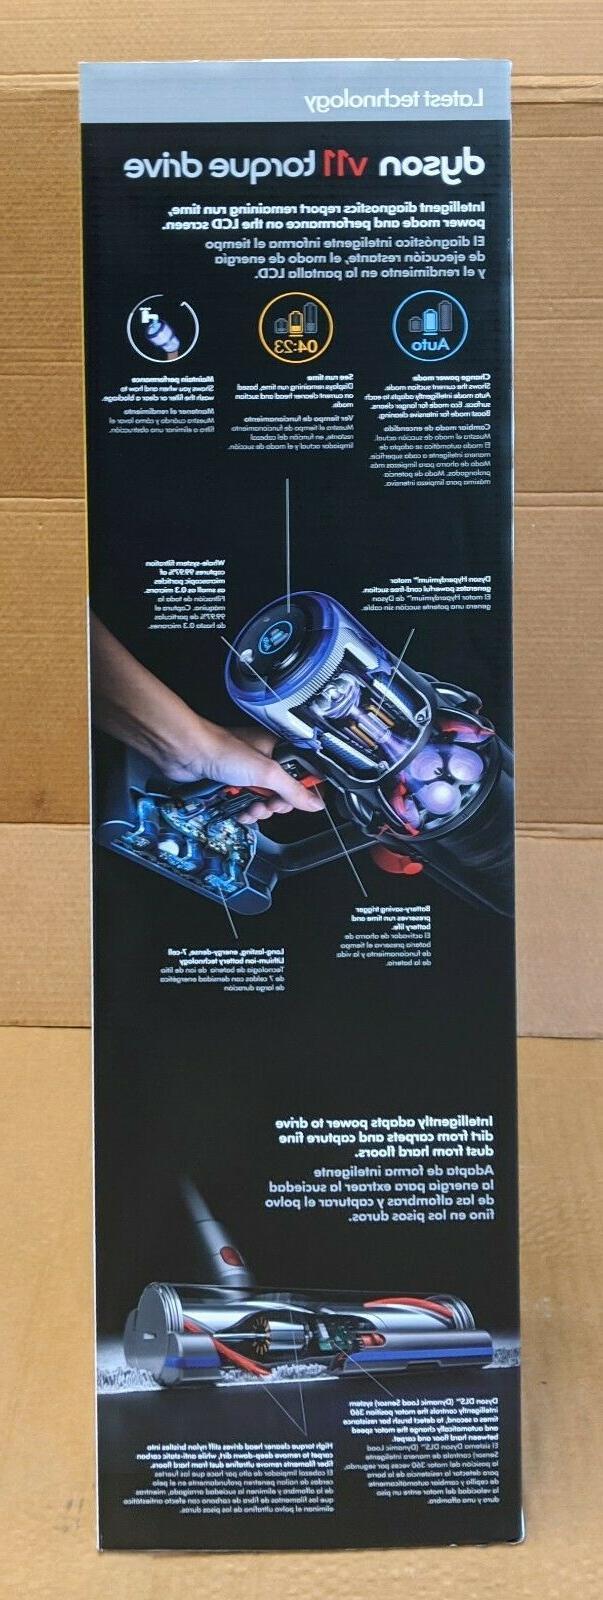 Dyson Torque Drive Cordless Vacuum | Blue Click-in